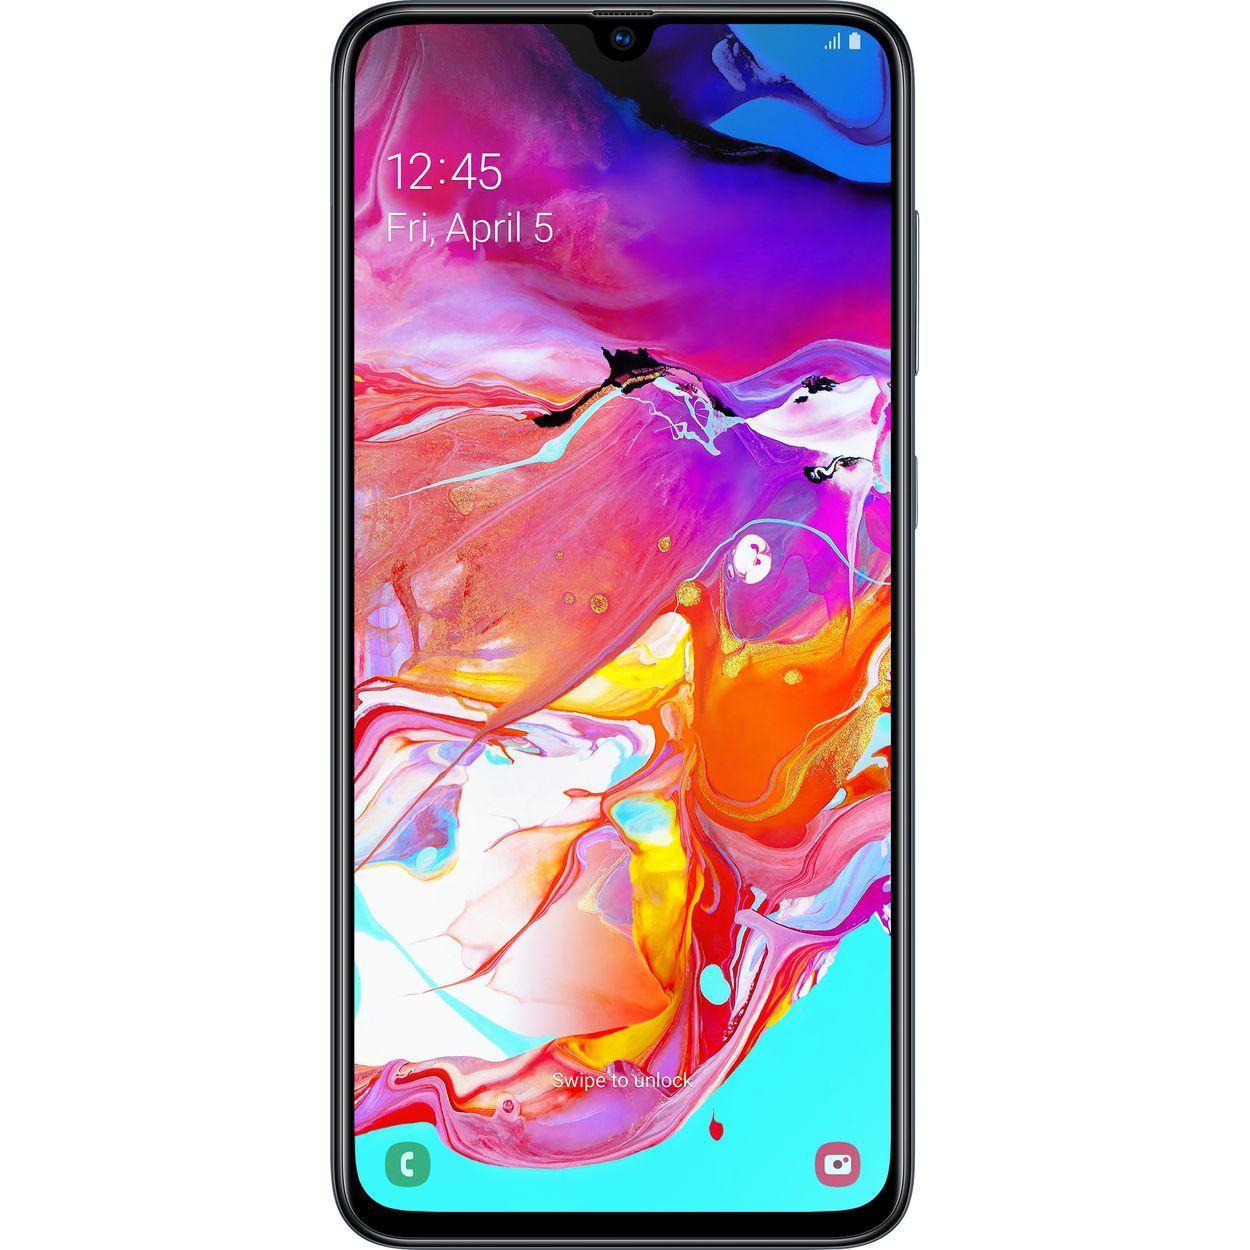 Telefon Mobil Samsung Galaxy A70 128GB Flash 6GB RAM Dual SIM 4G Black